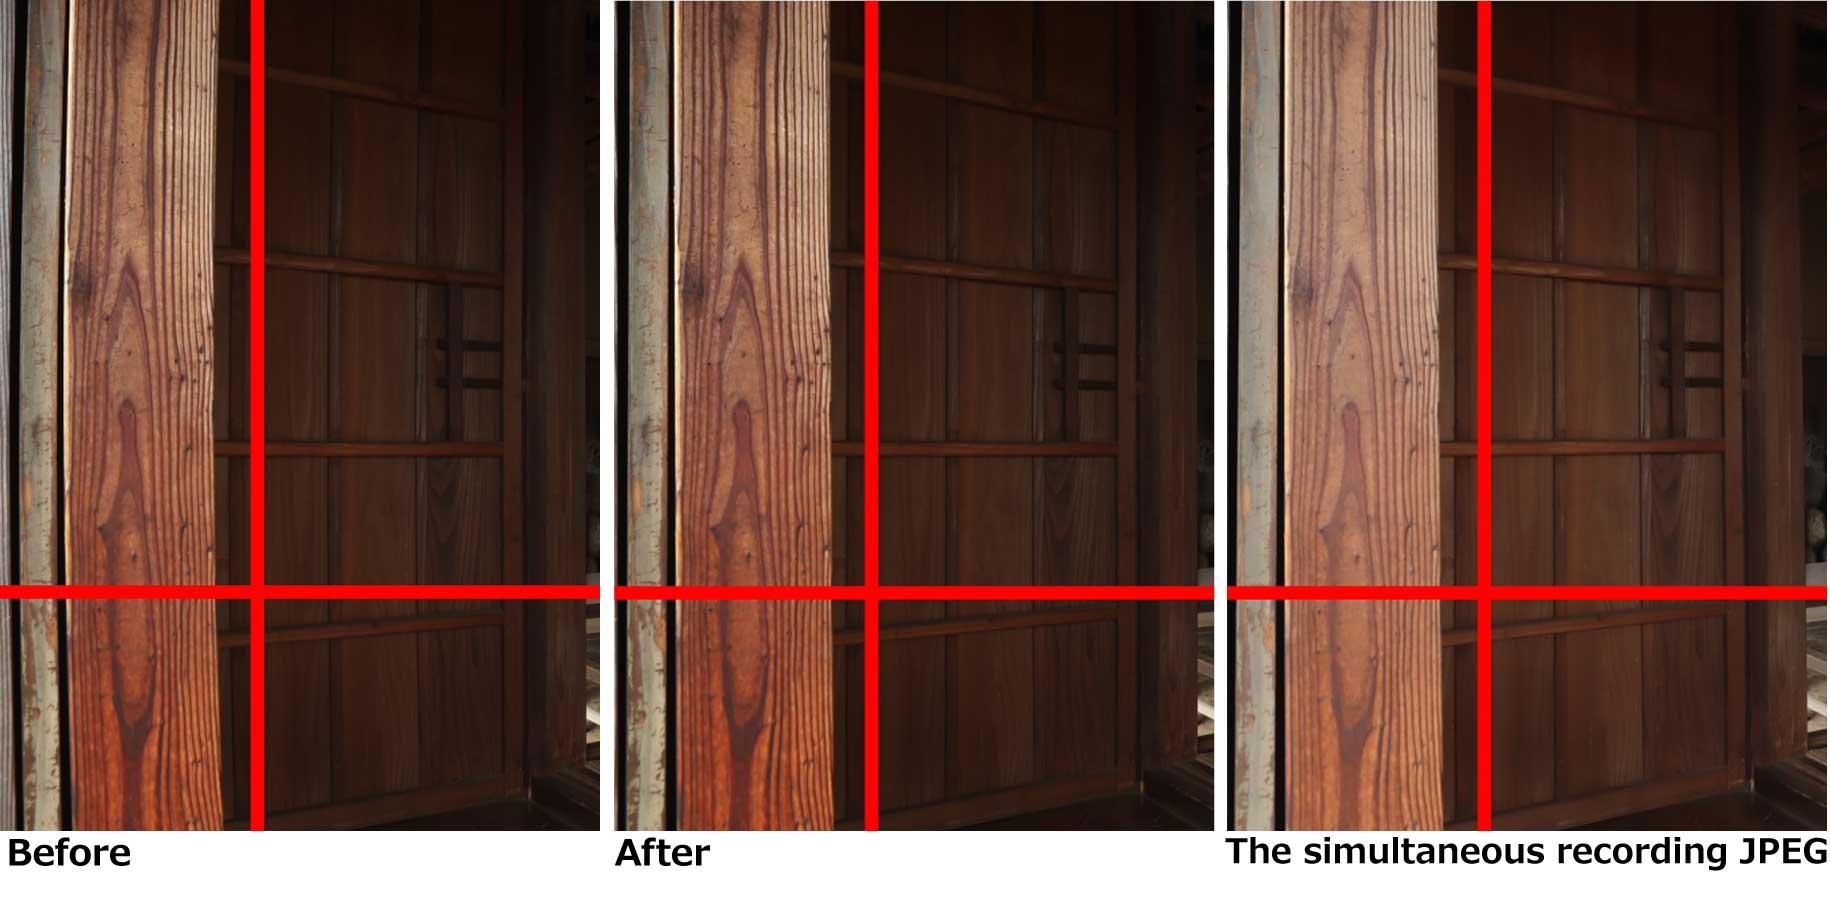 Automatic distortion correction using JPEG 2-2